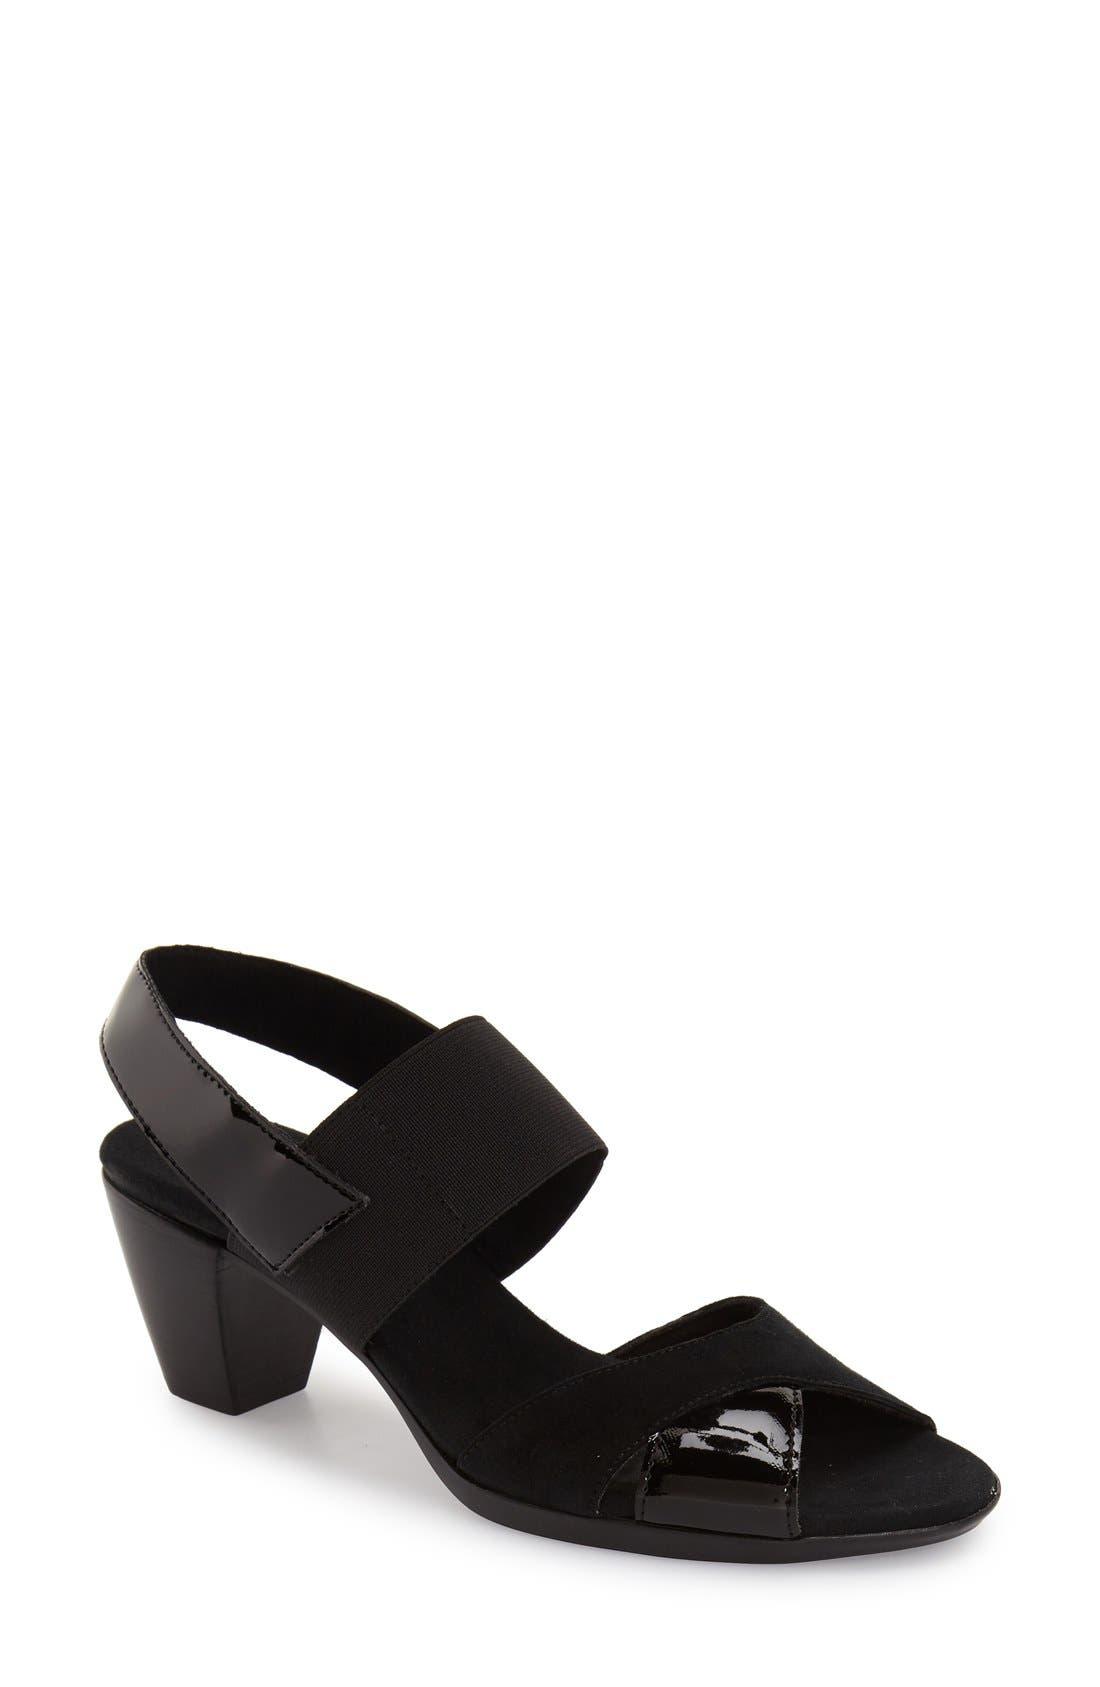 MUNRO Darling Mixed Finish Slingback Sandal, Main, color, BLACK COMBO